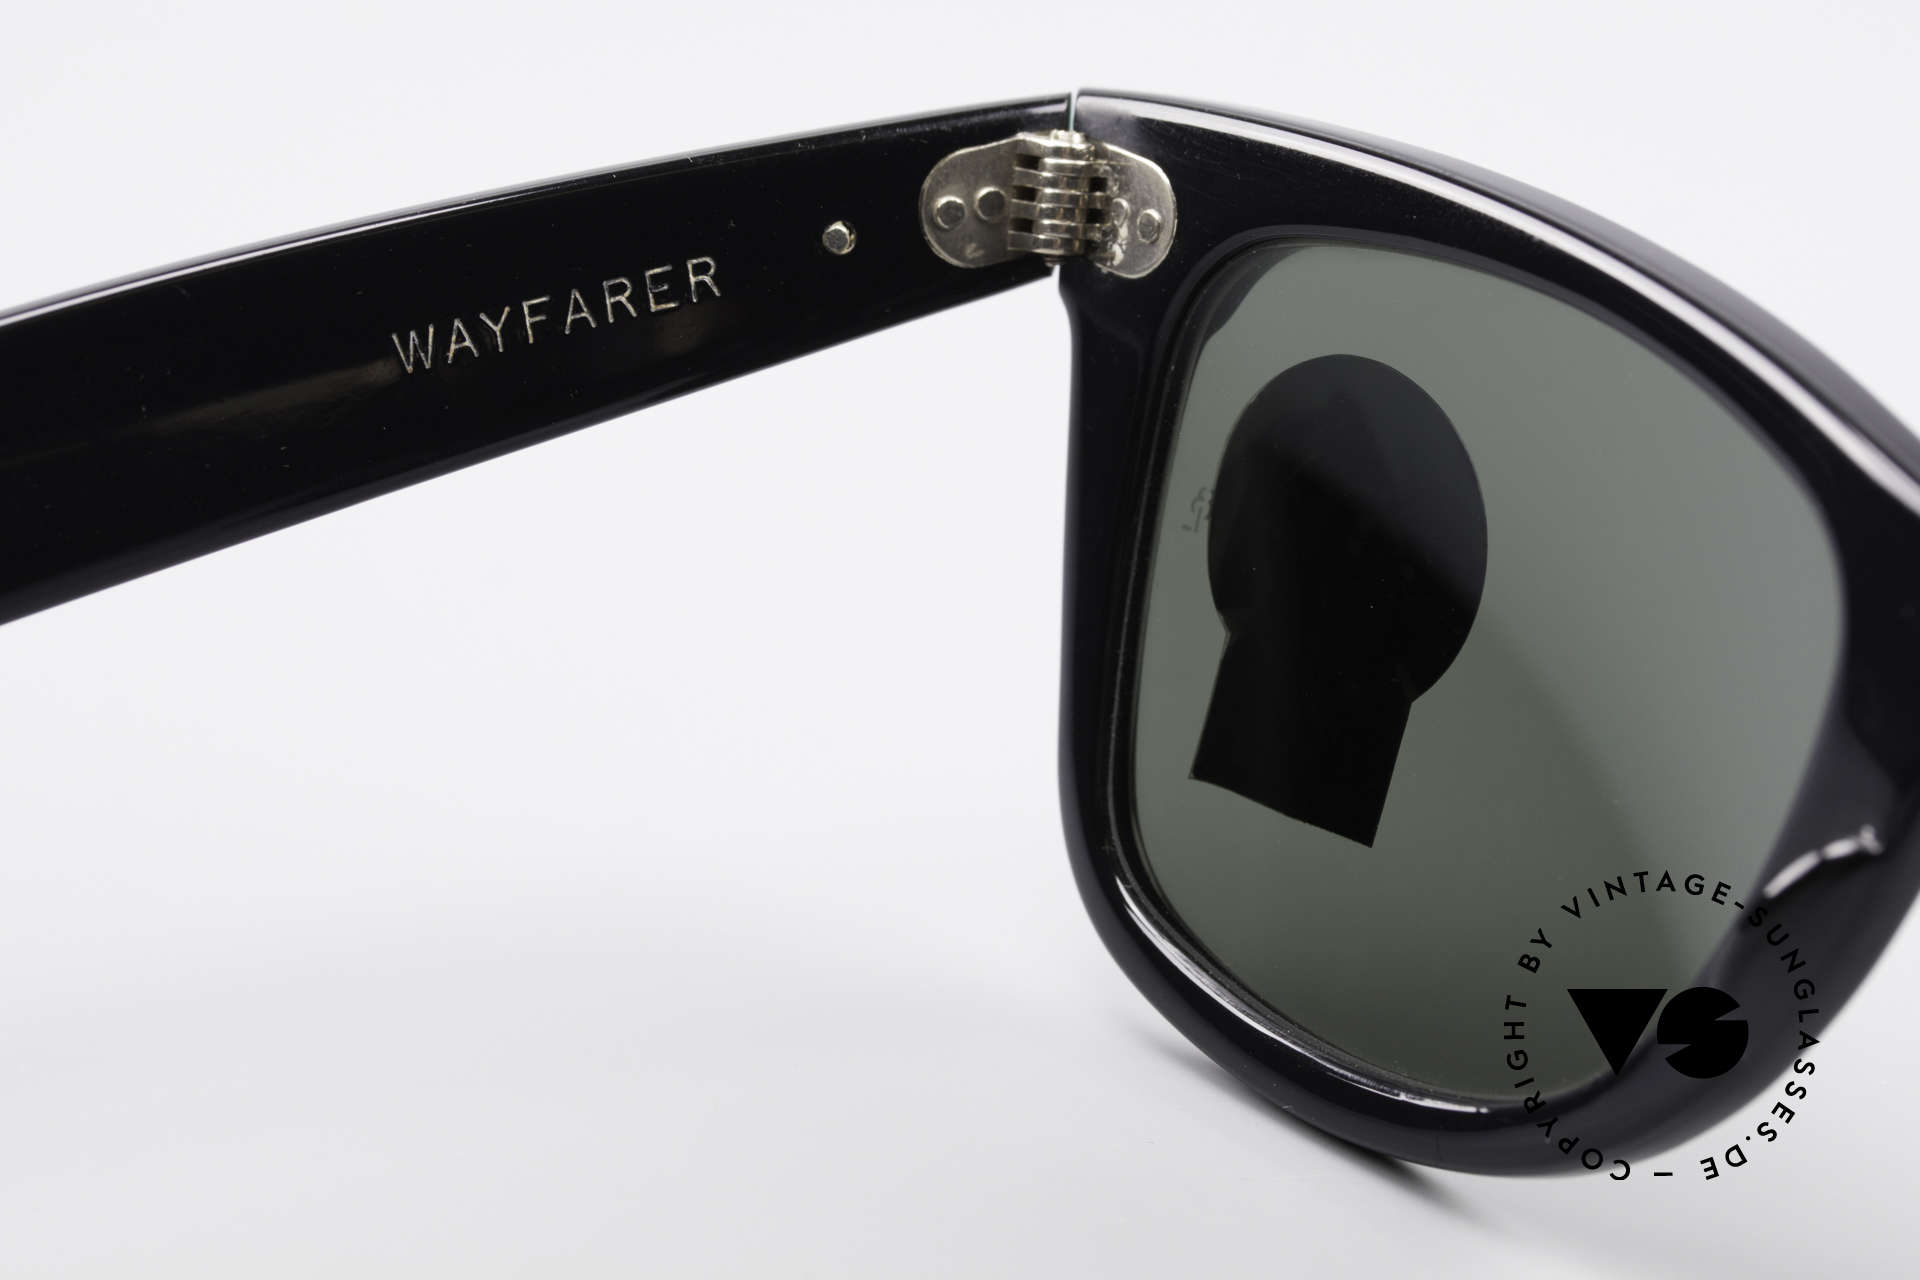 Ray Ban Wayfarer I Old 80's USA Sunglasses B&L, NO retro Italy-Wayfarer; an old 80's USA ORIGINAL, Made for Men and Women